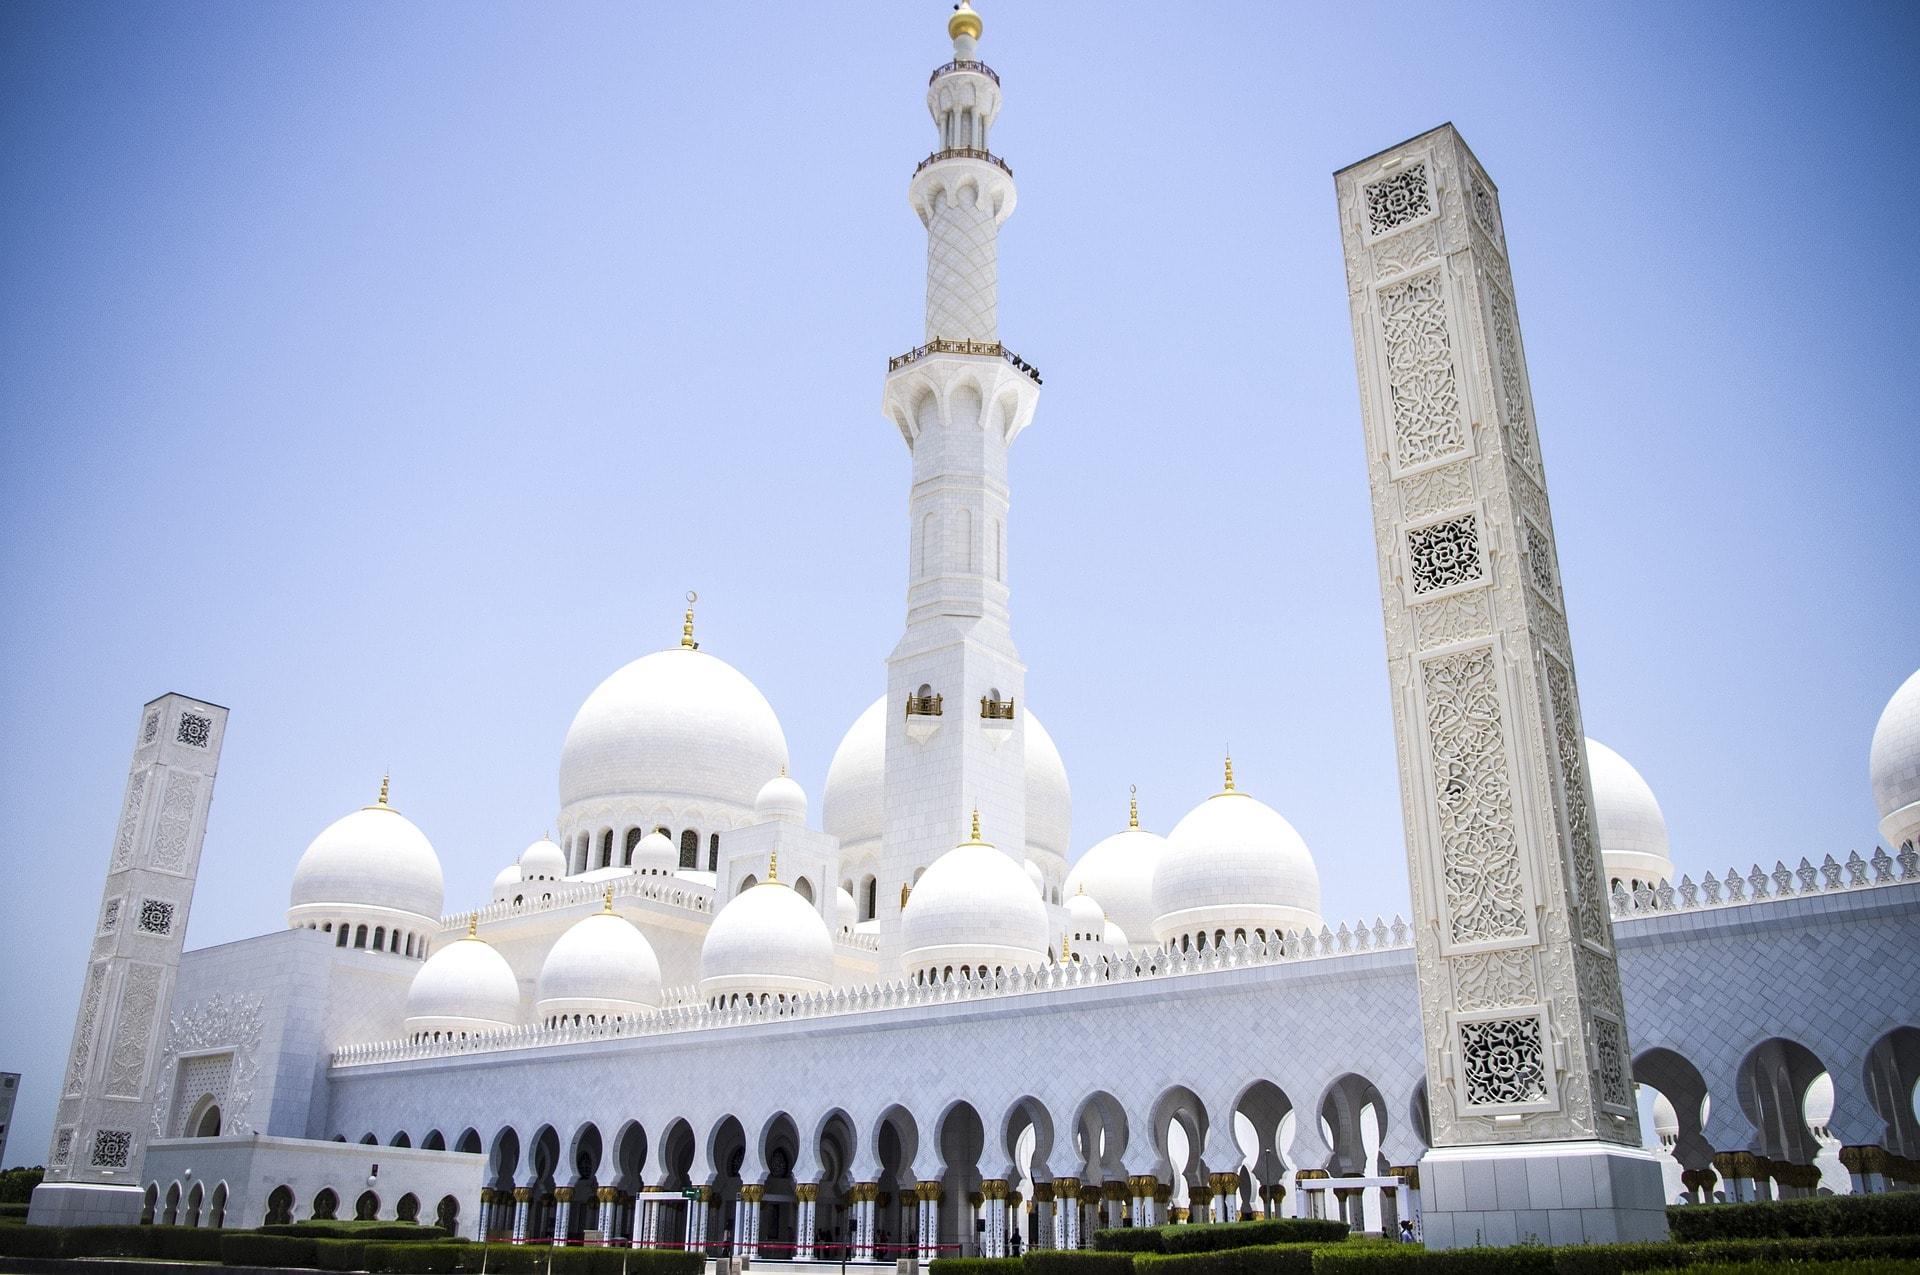 Sights of Abu Dhabi: what is definitely worth seeing 17